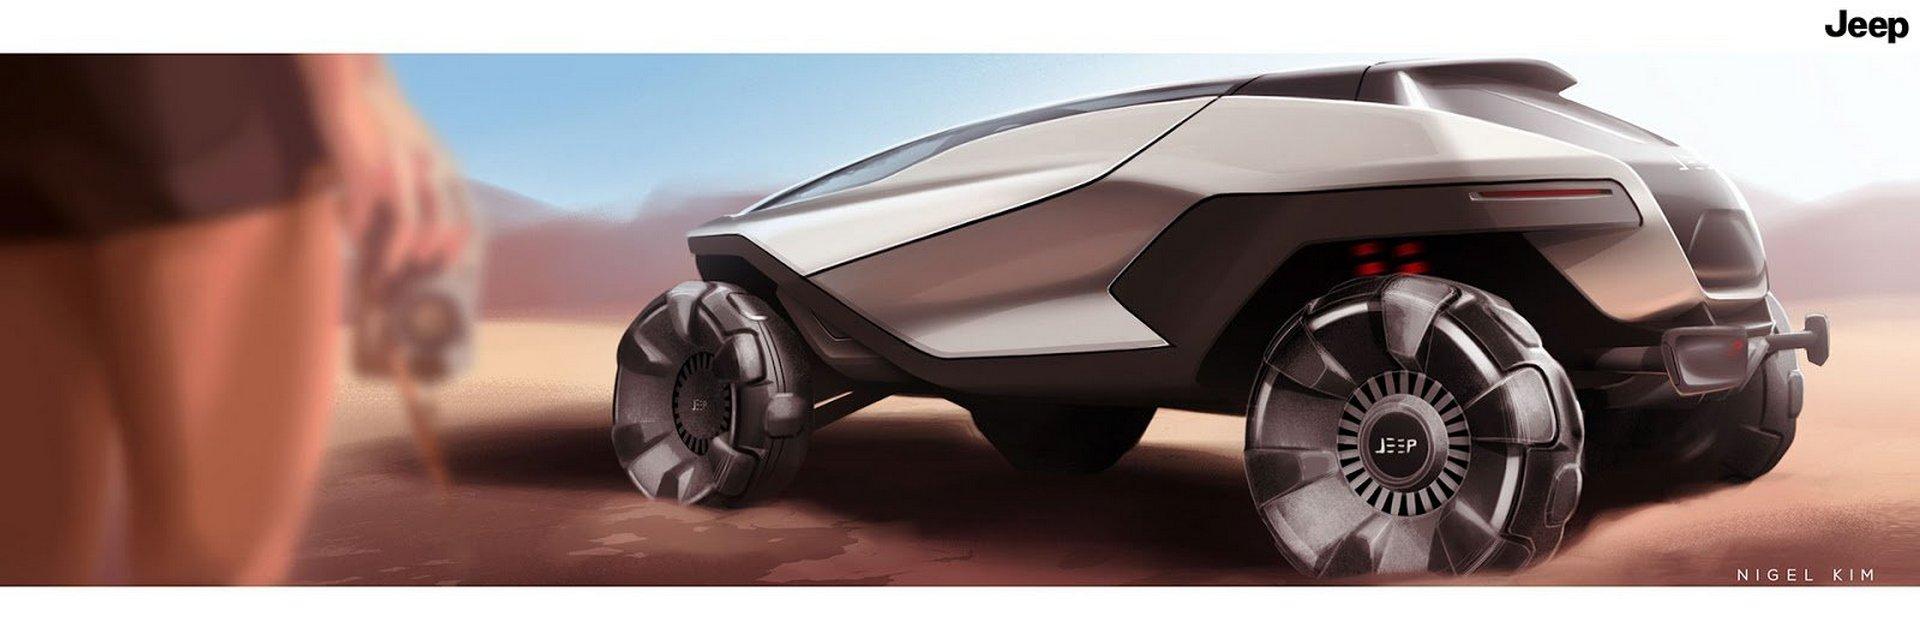 Jeep 2035